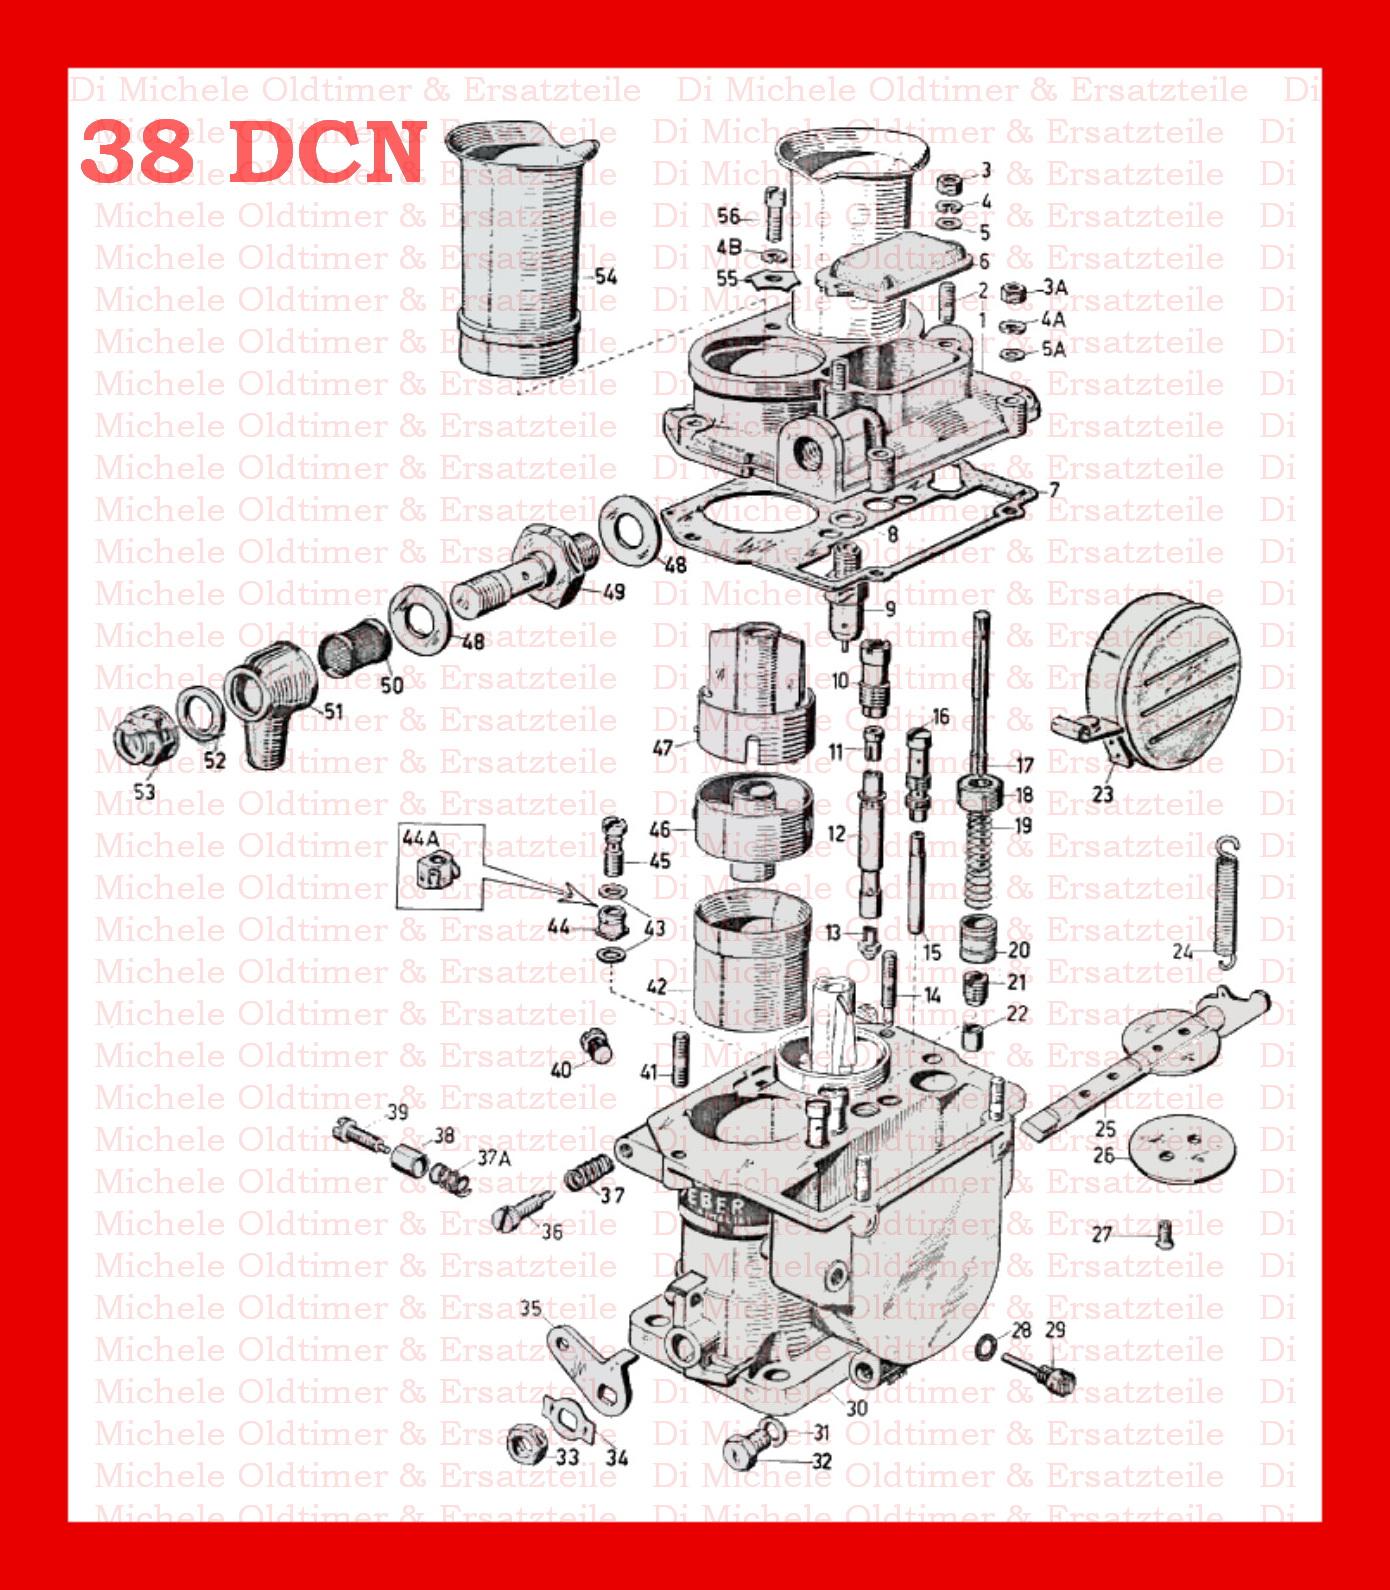 38 DCN T end